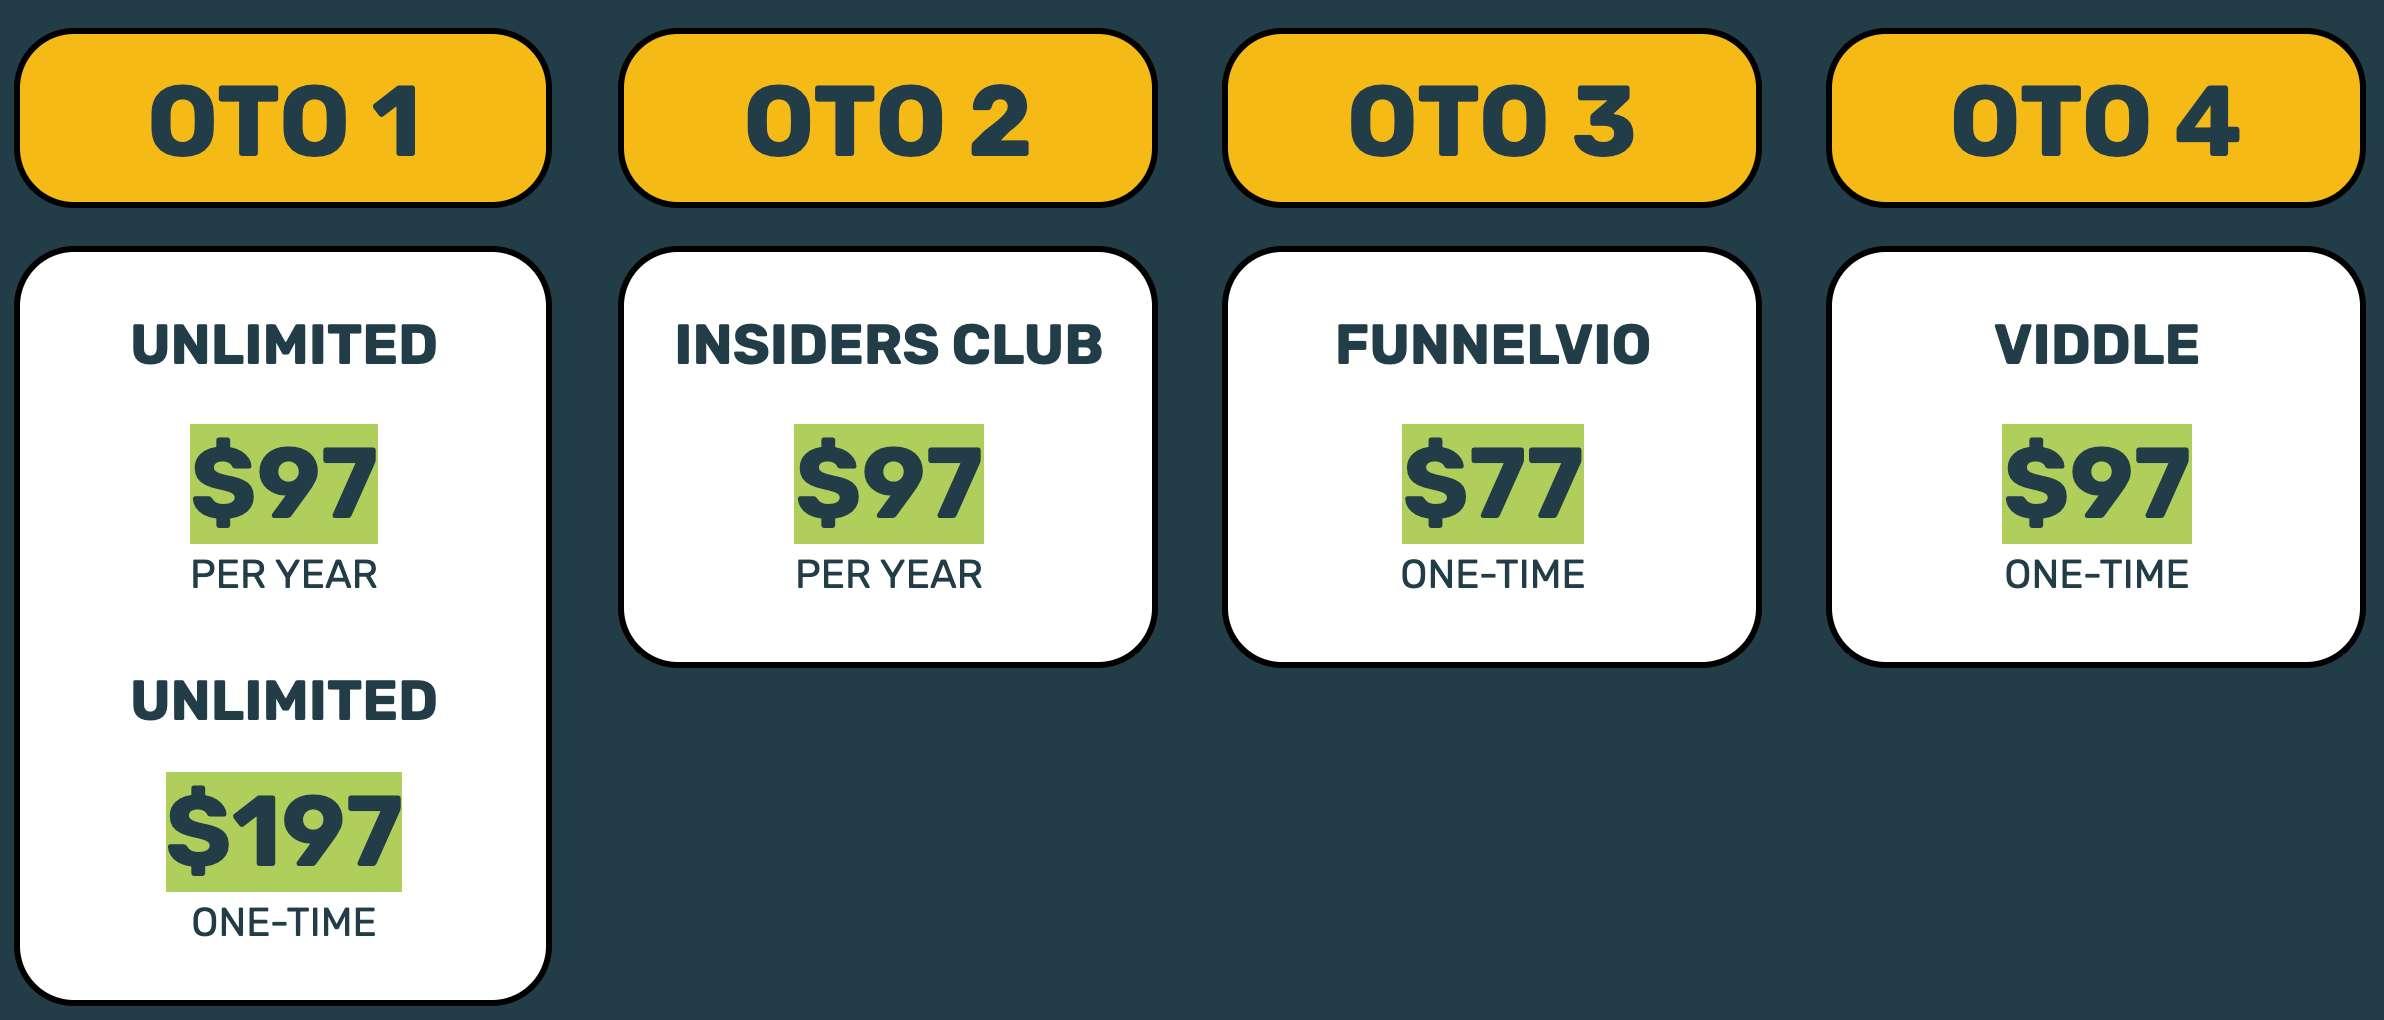 membervio pricing, upsells and otos